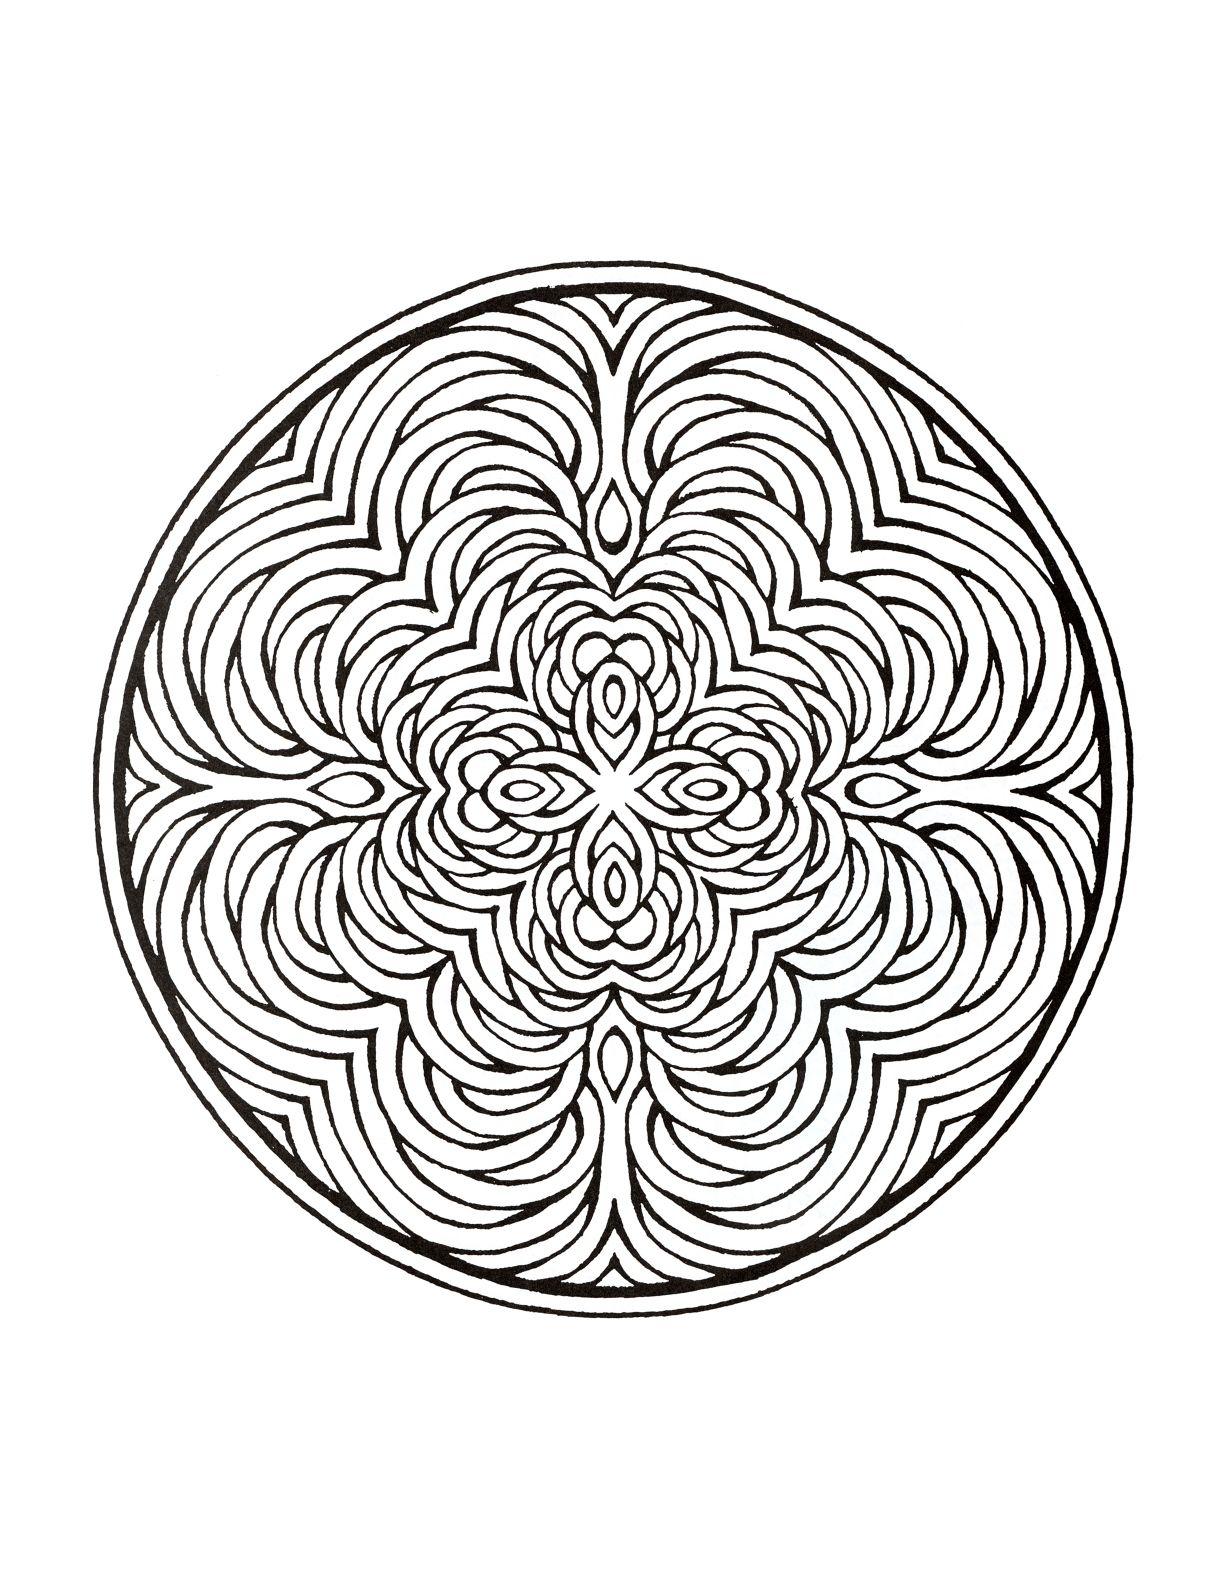 Mystical Mandala Coloring Book   Adult Coloring Pages   Pinterest ...